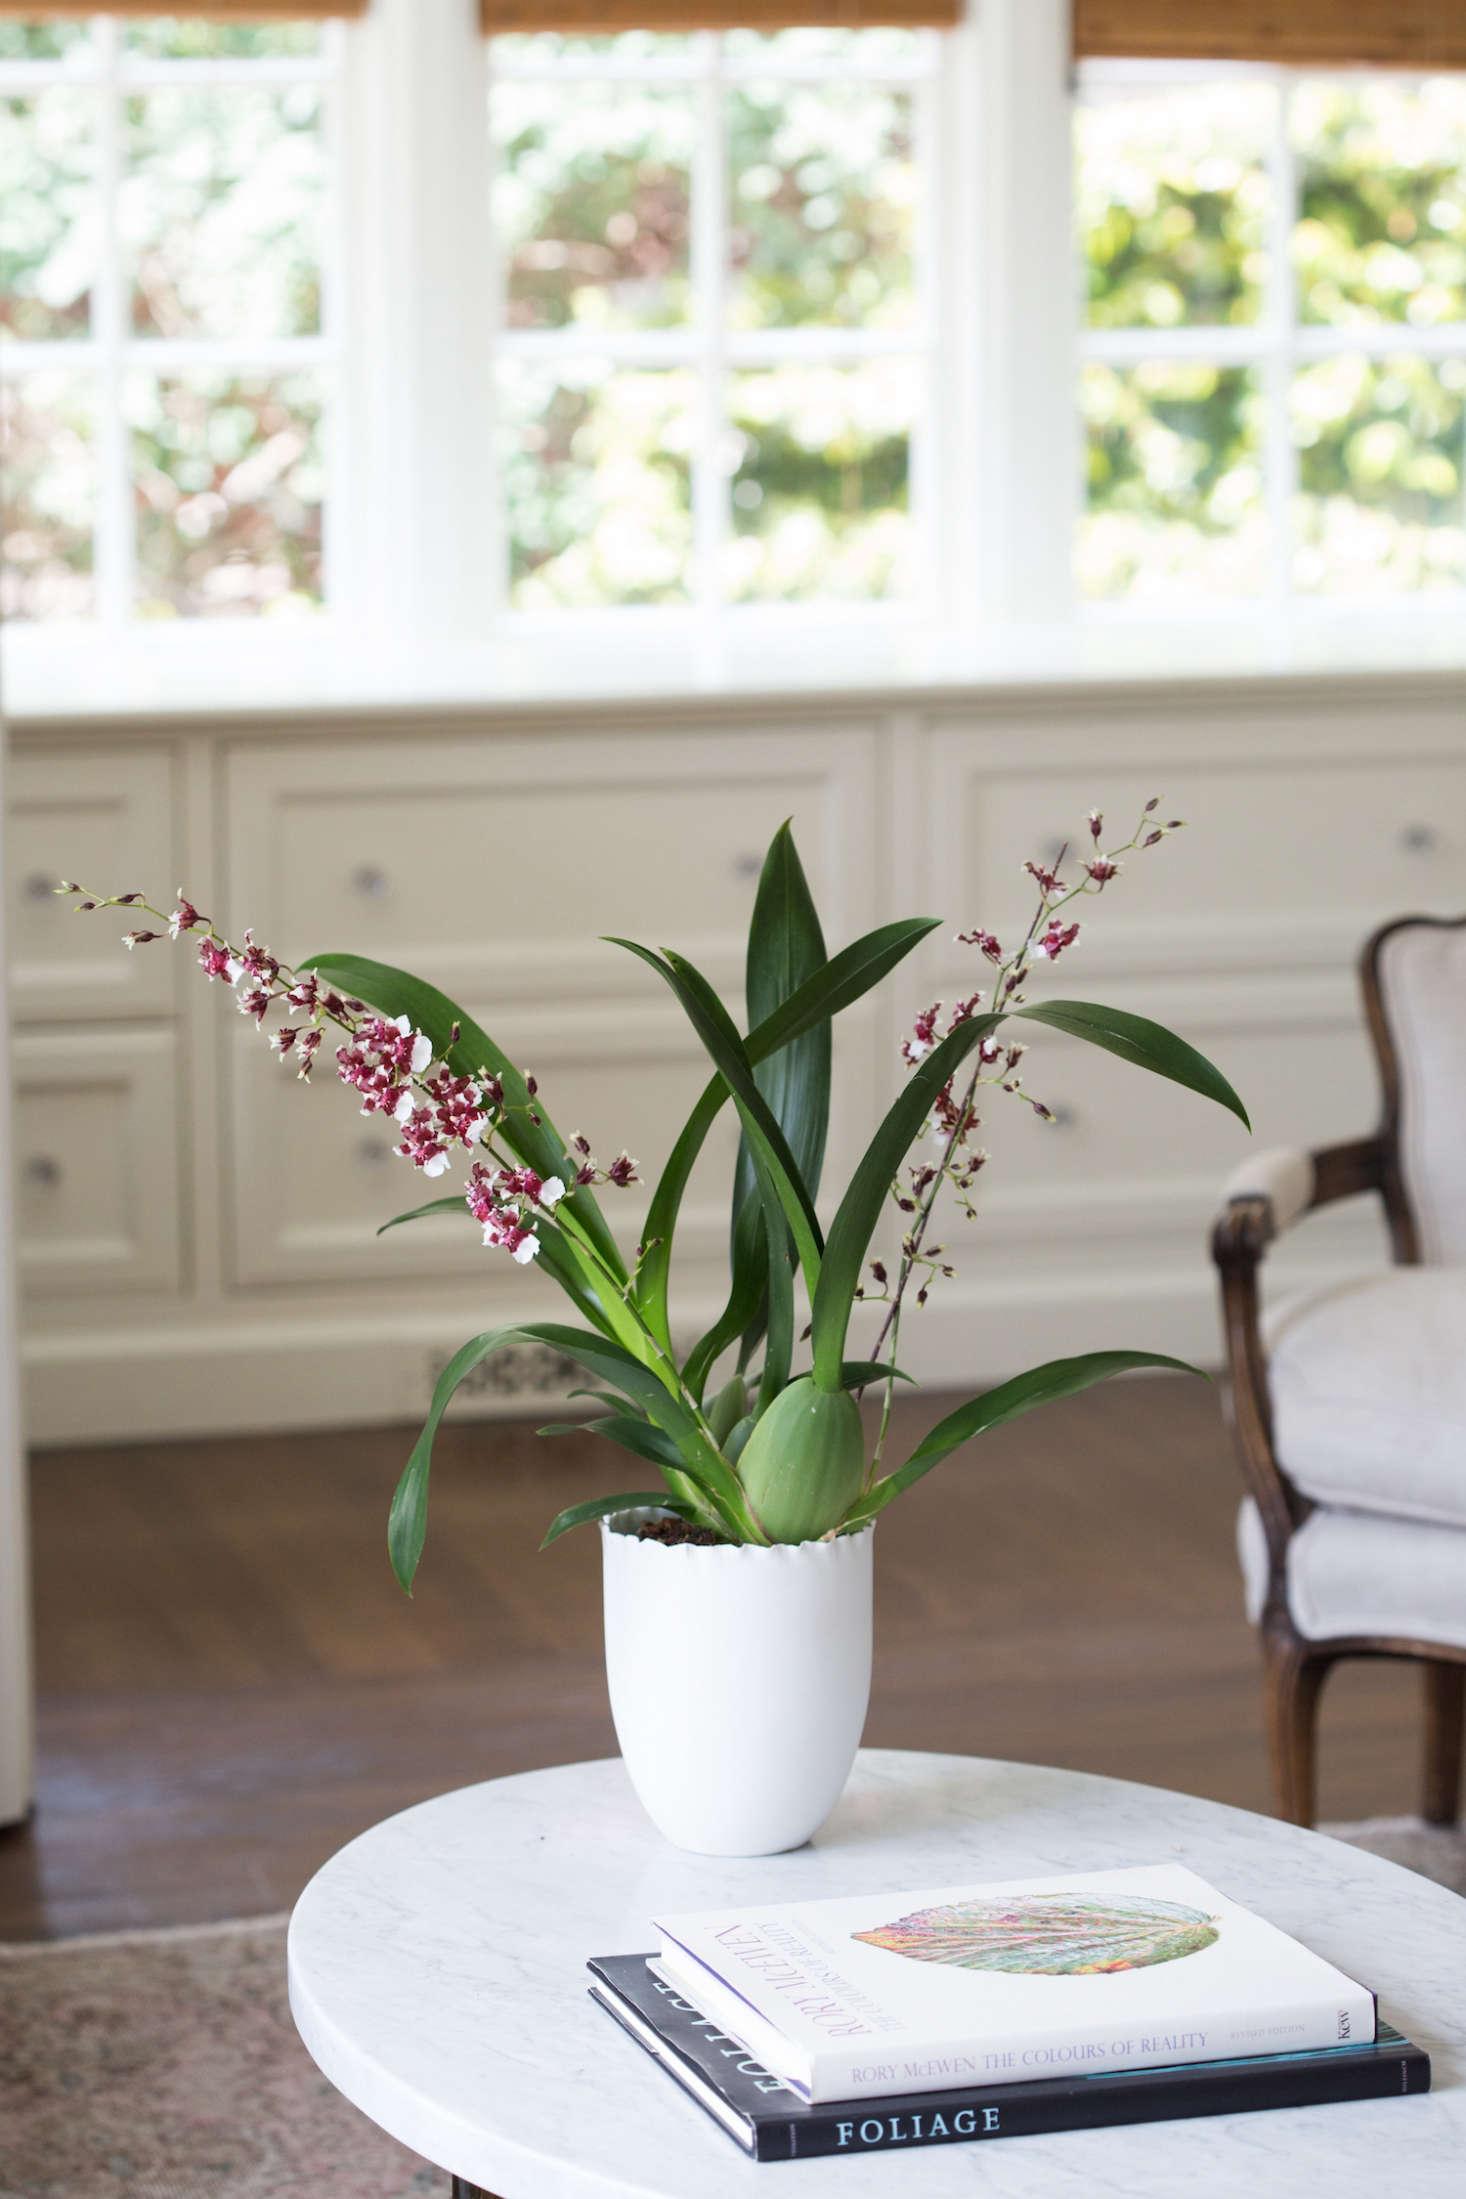 An oncidium, Sharry Baby has striking, speckled chocolate-colored petals; an Oncidium Sharry Baby in a 5 src=